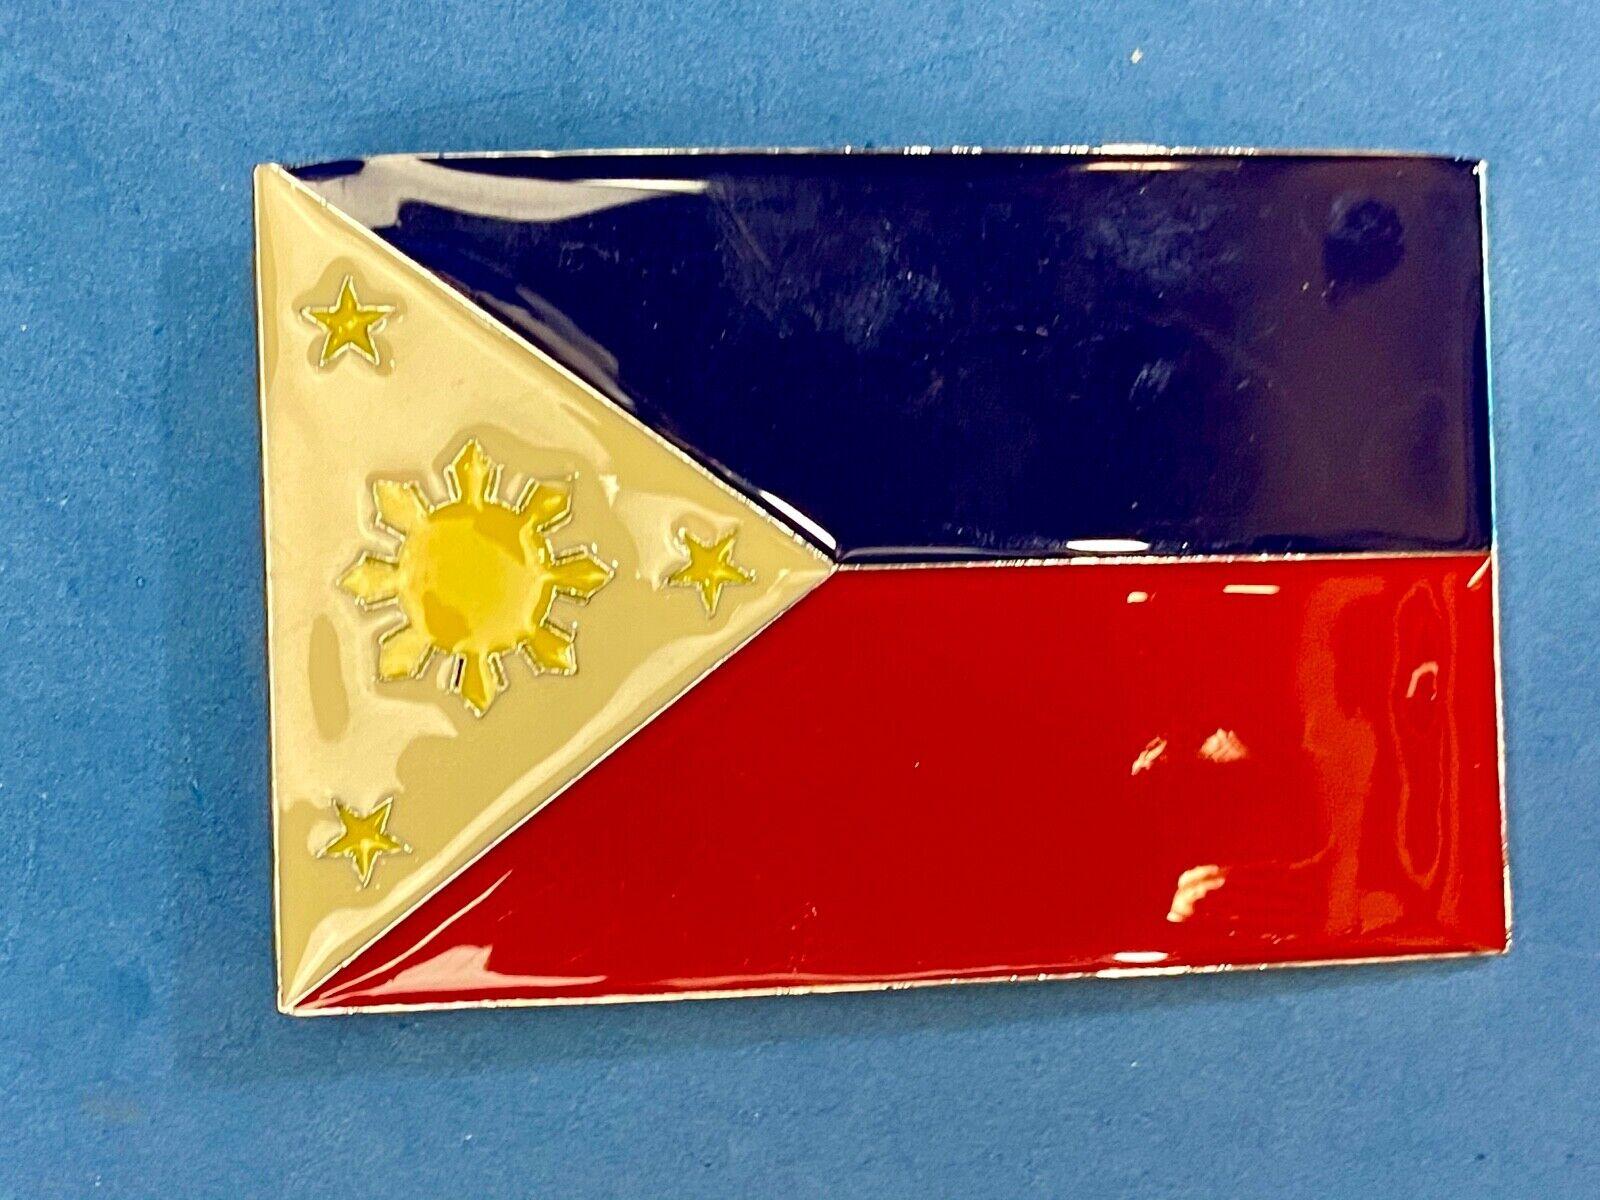 National Flag, Republic of the Philippines belt buckle by Emilio Aguinaldo 1897